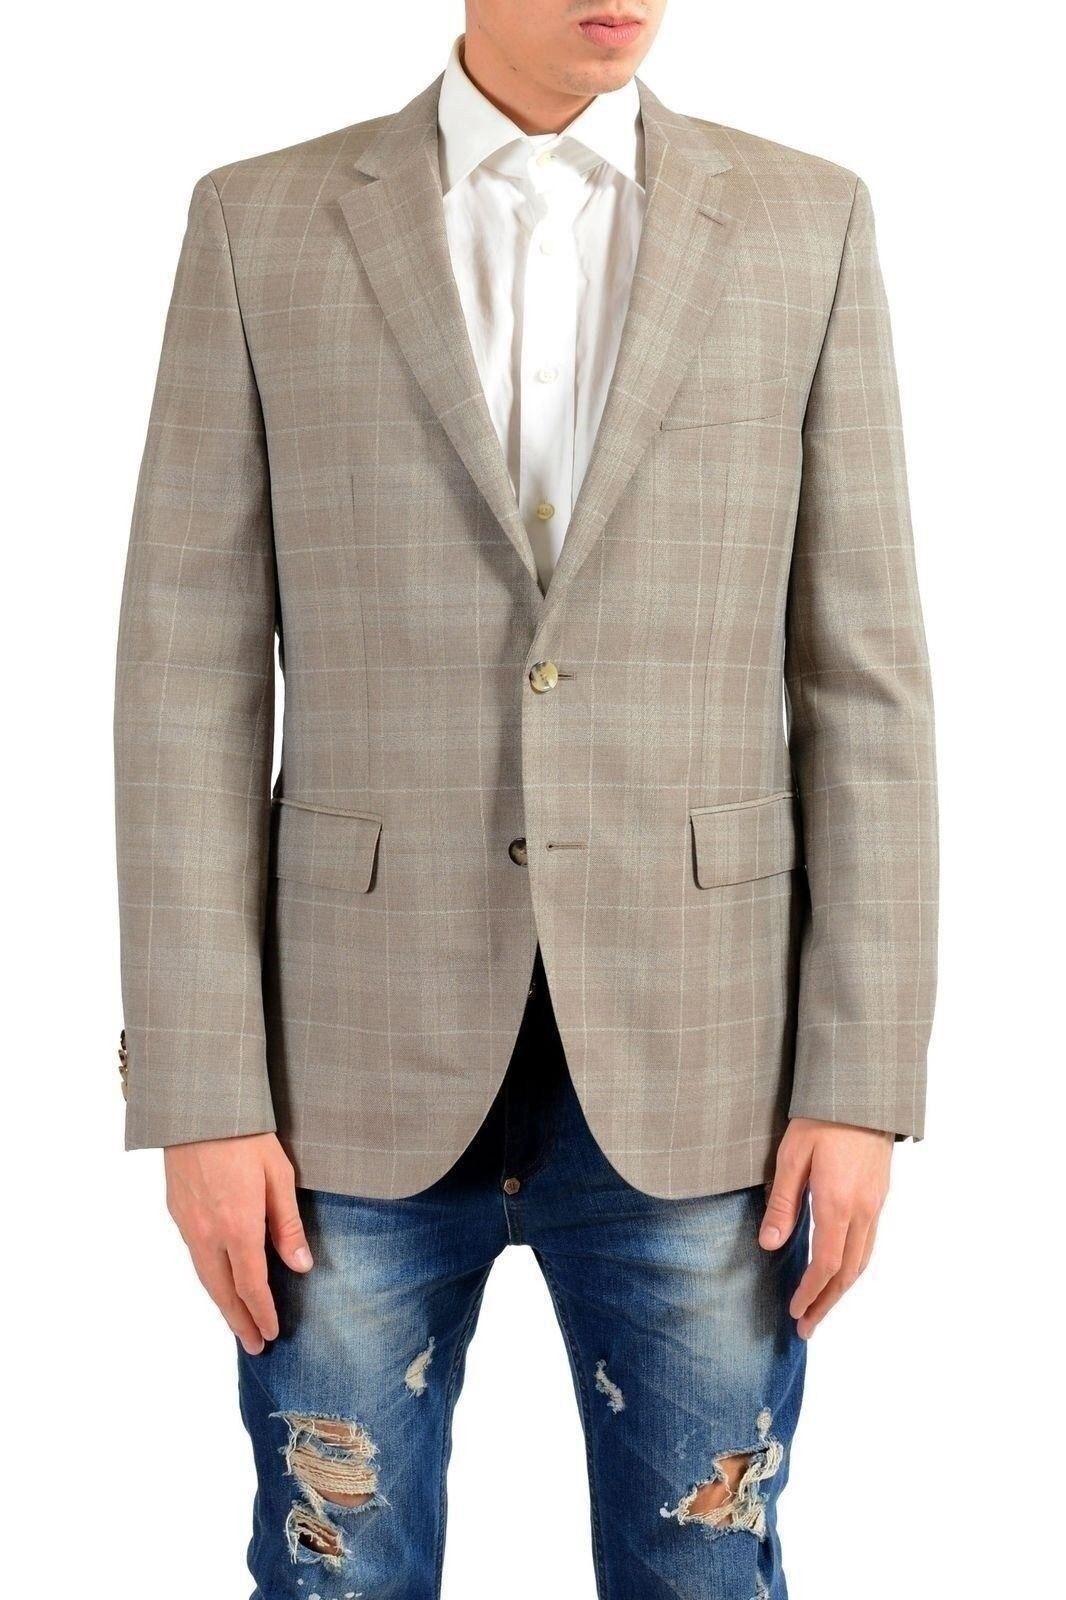 Hugo Boss  Jeen2  Men's 100% Wool Plaid Blazer Sport Coat US 40R IT 50R